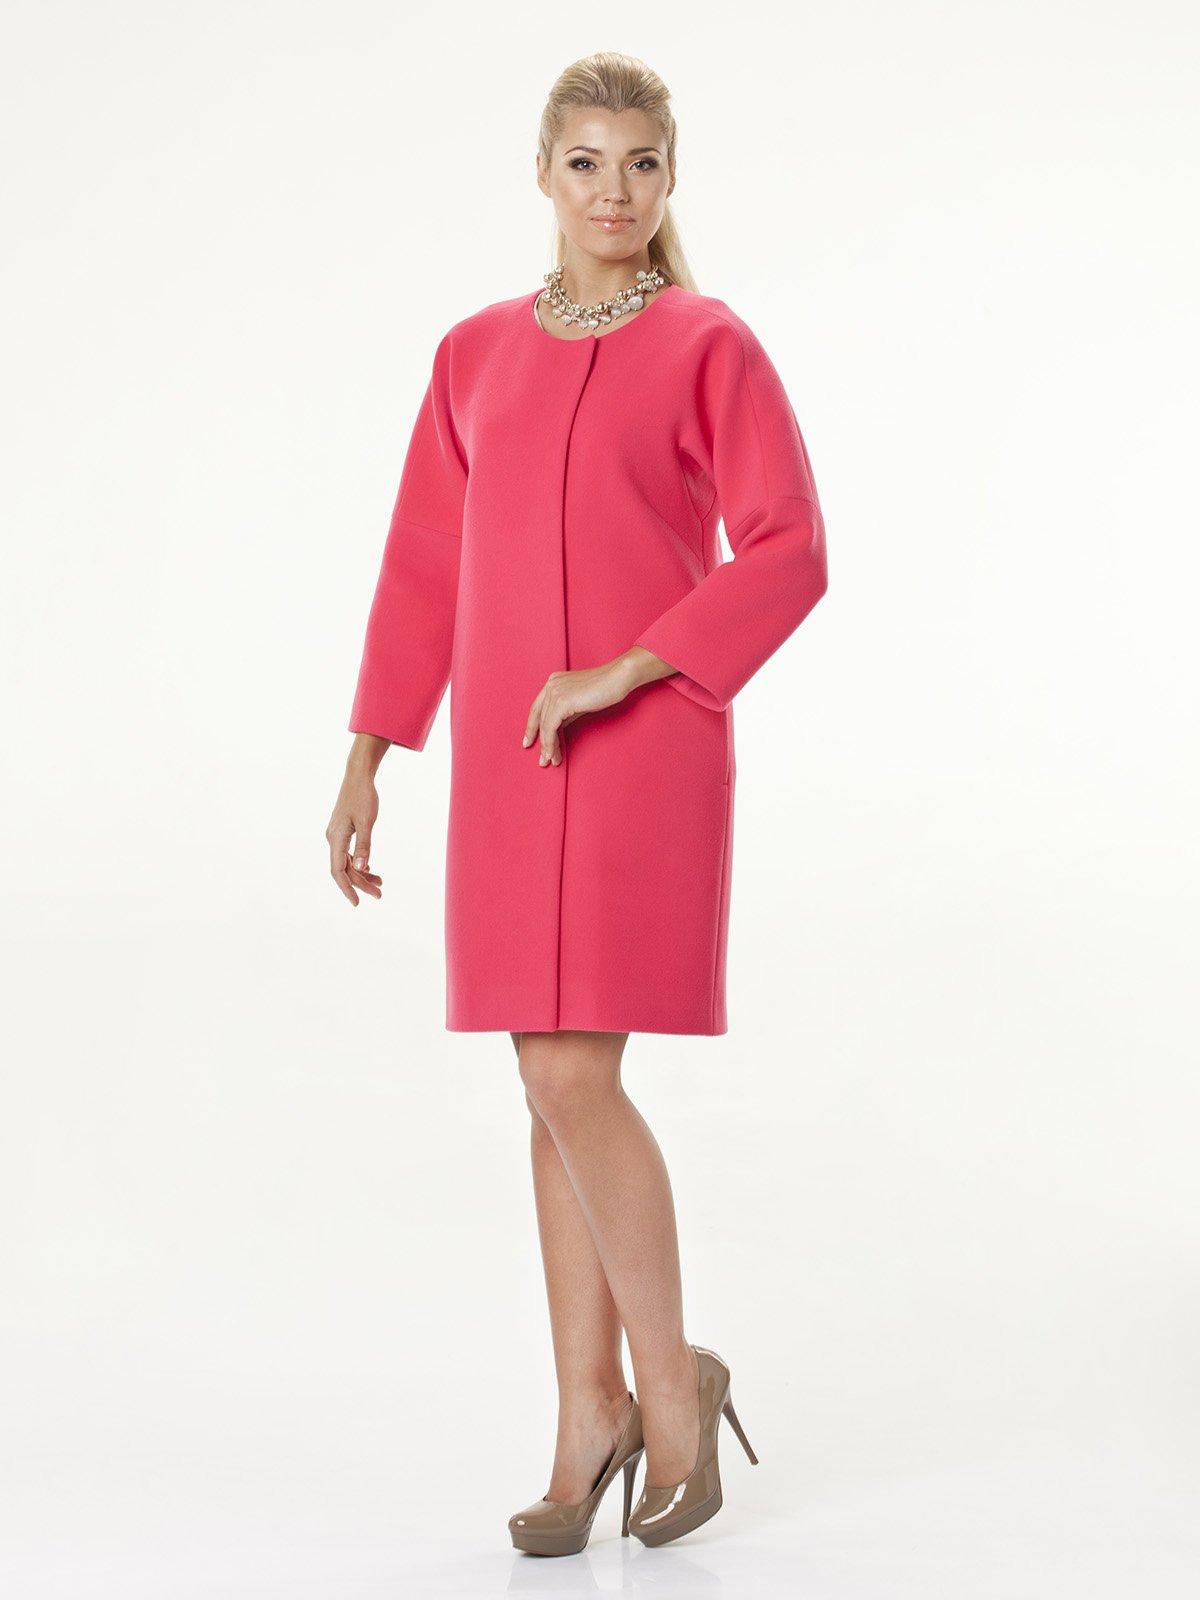 Пальто розовое | 2074798 | фото 3